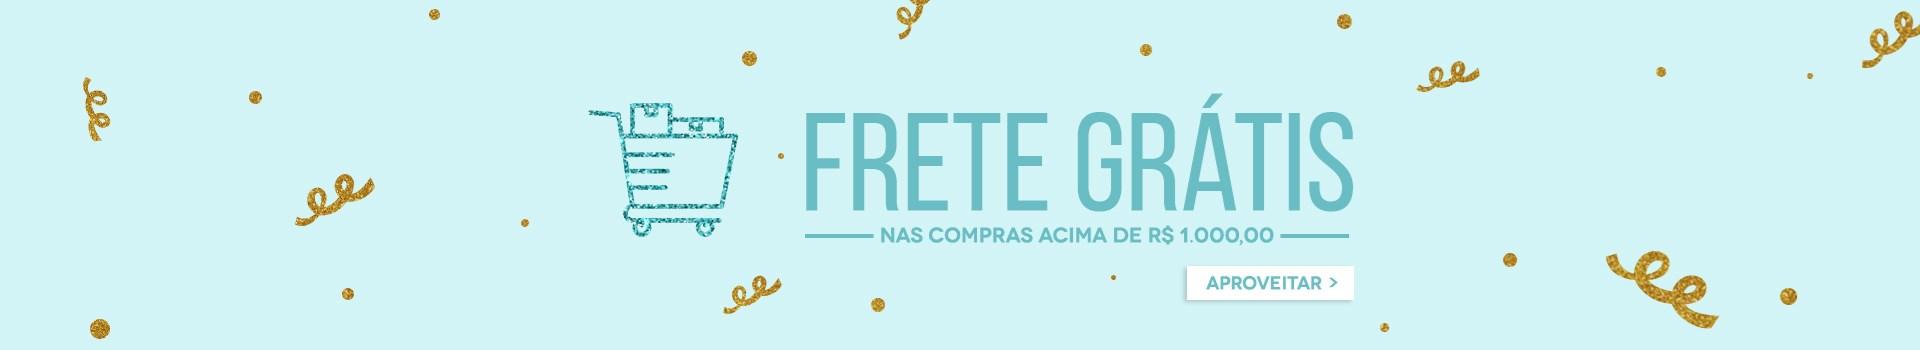 Frete Grátis | Serilon Crafts